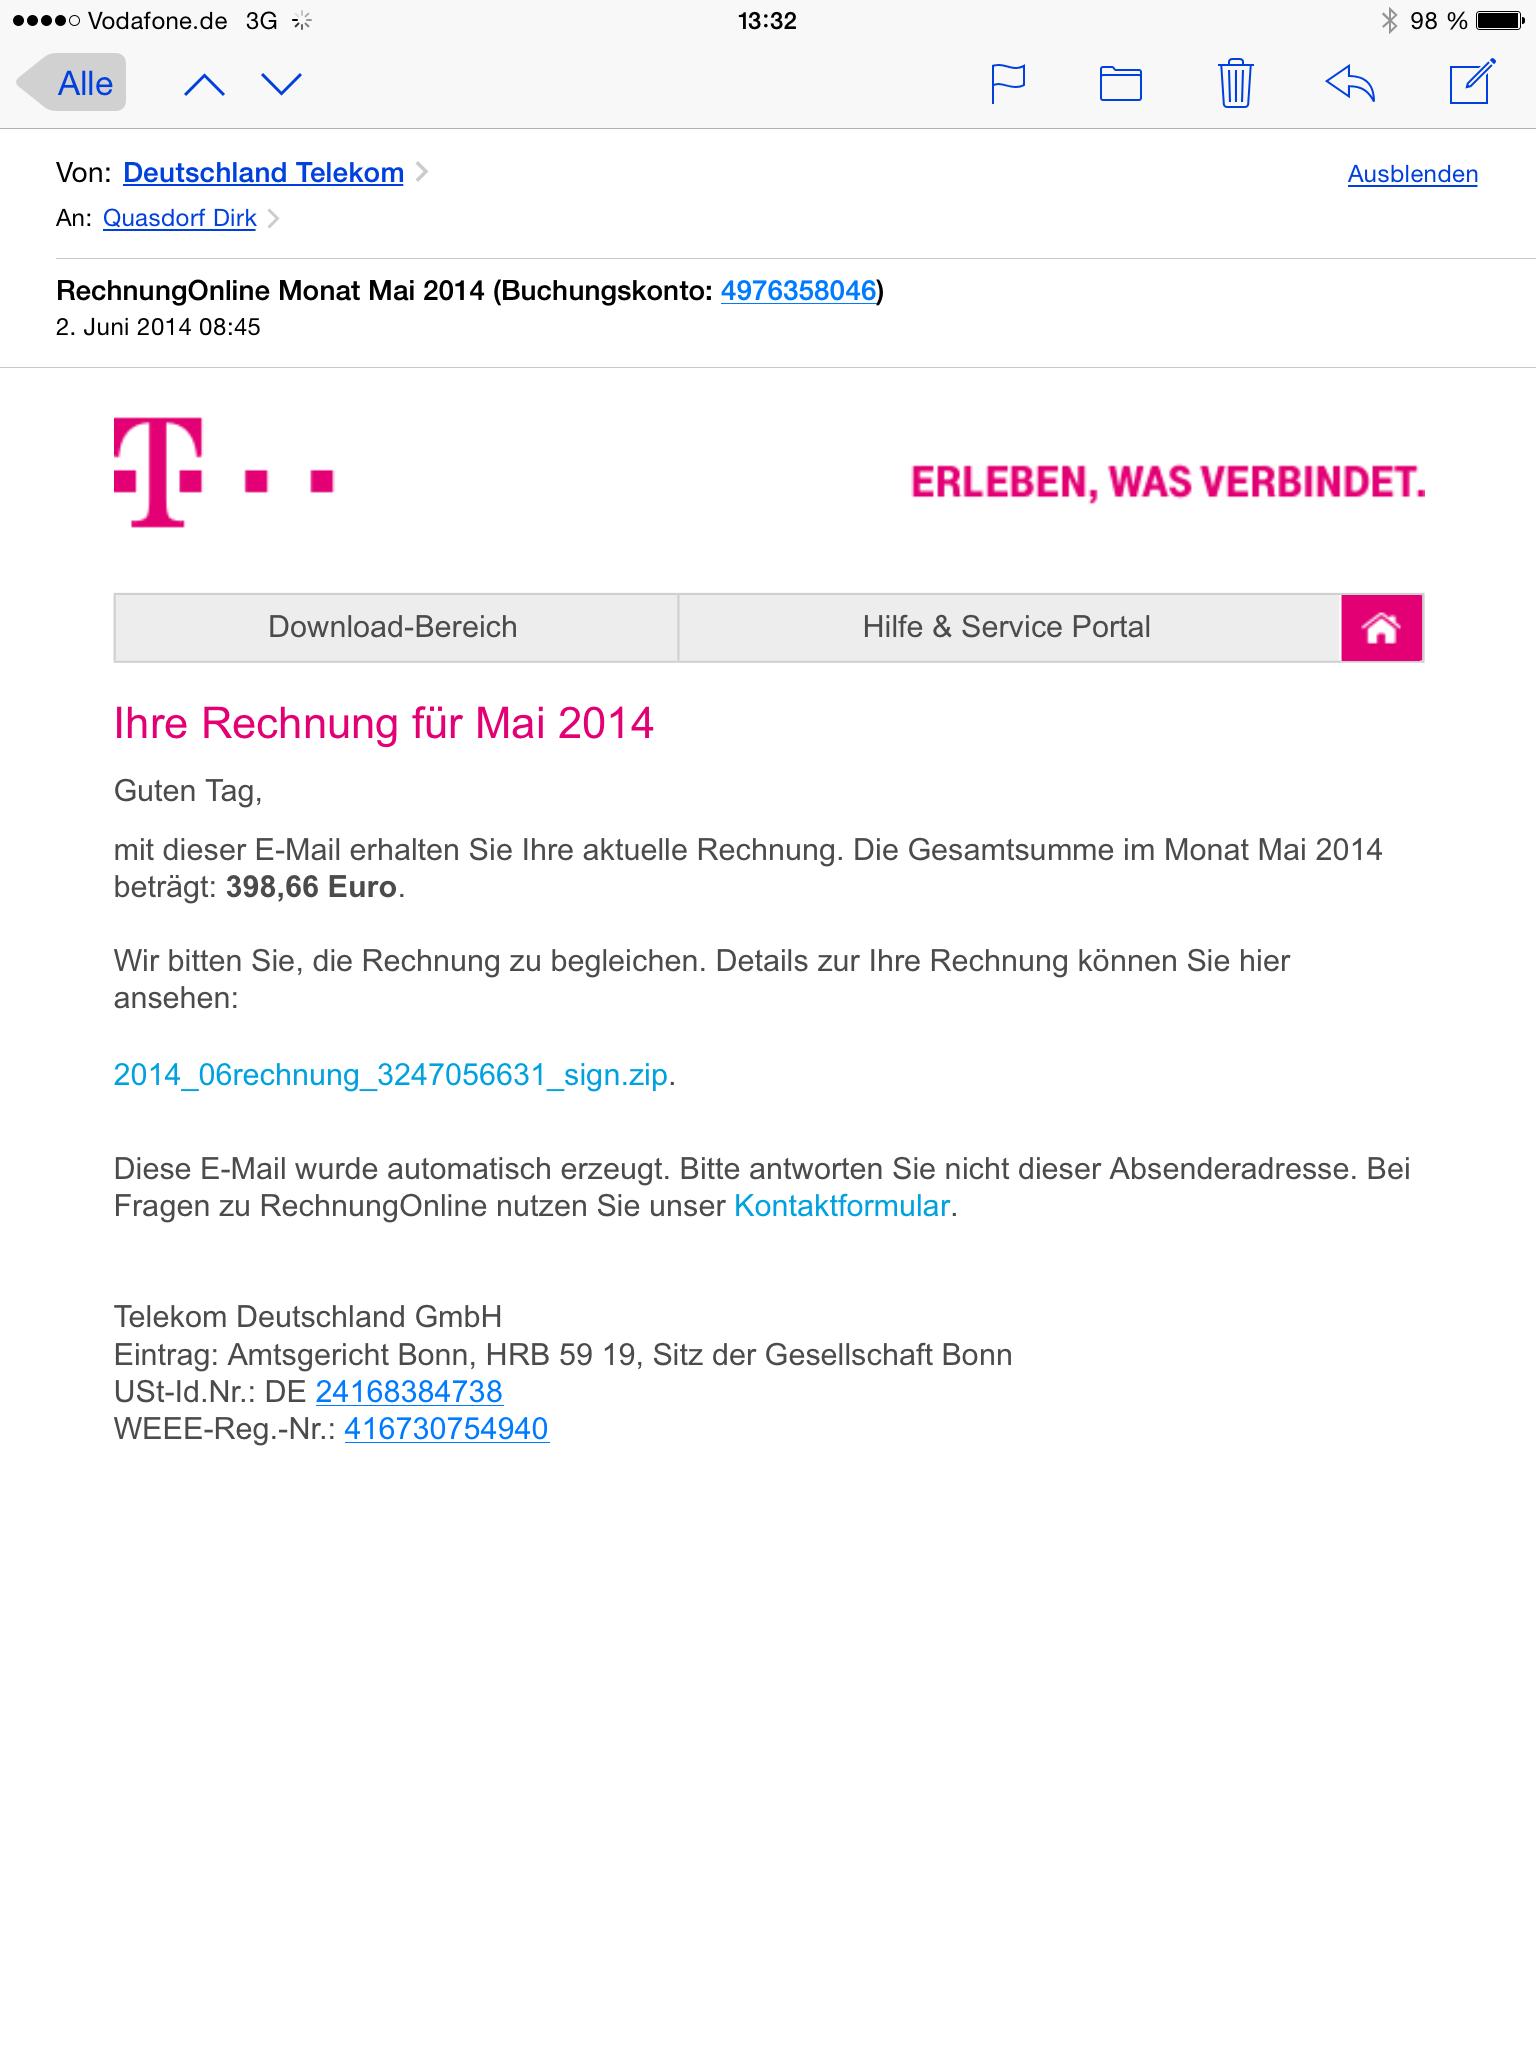 Angebliche Telekom Mail Dq Soft Dina Quasdorf